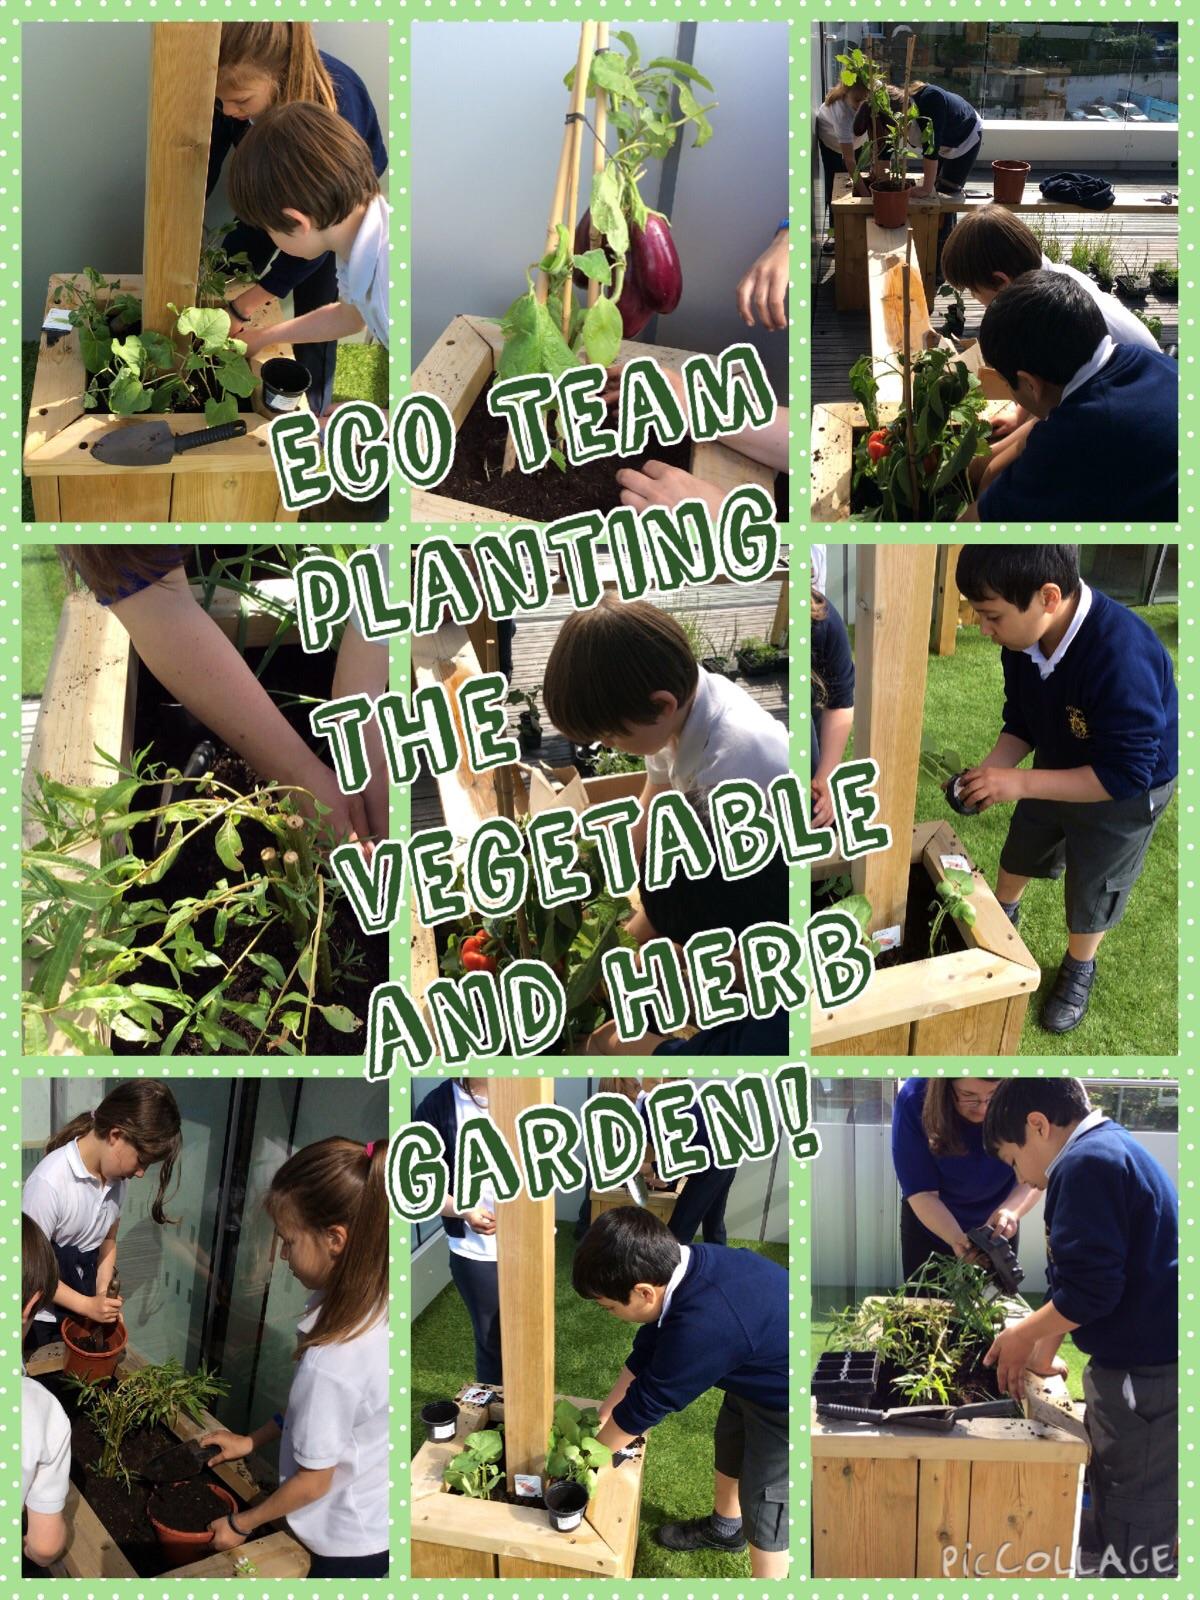 Eco Team planting